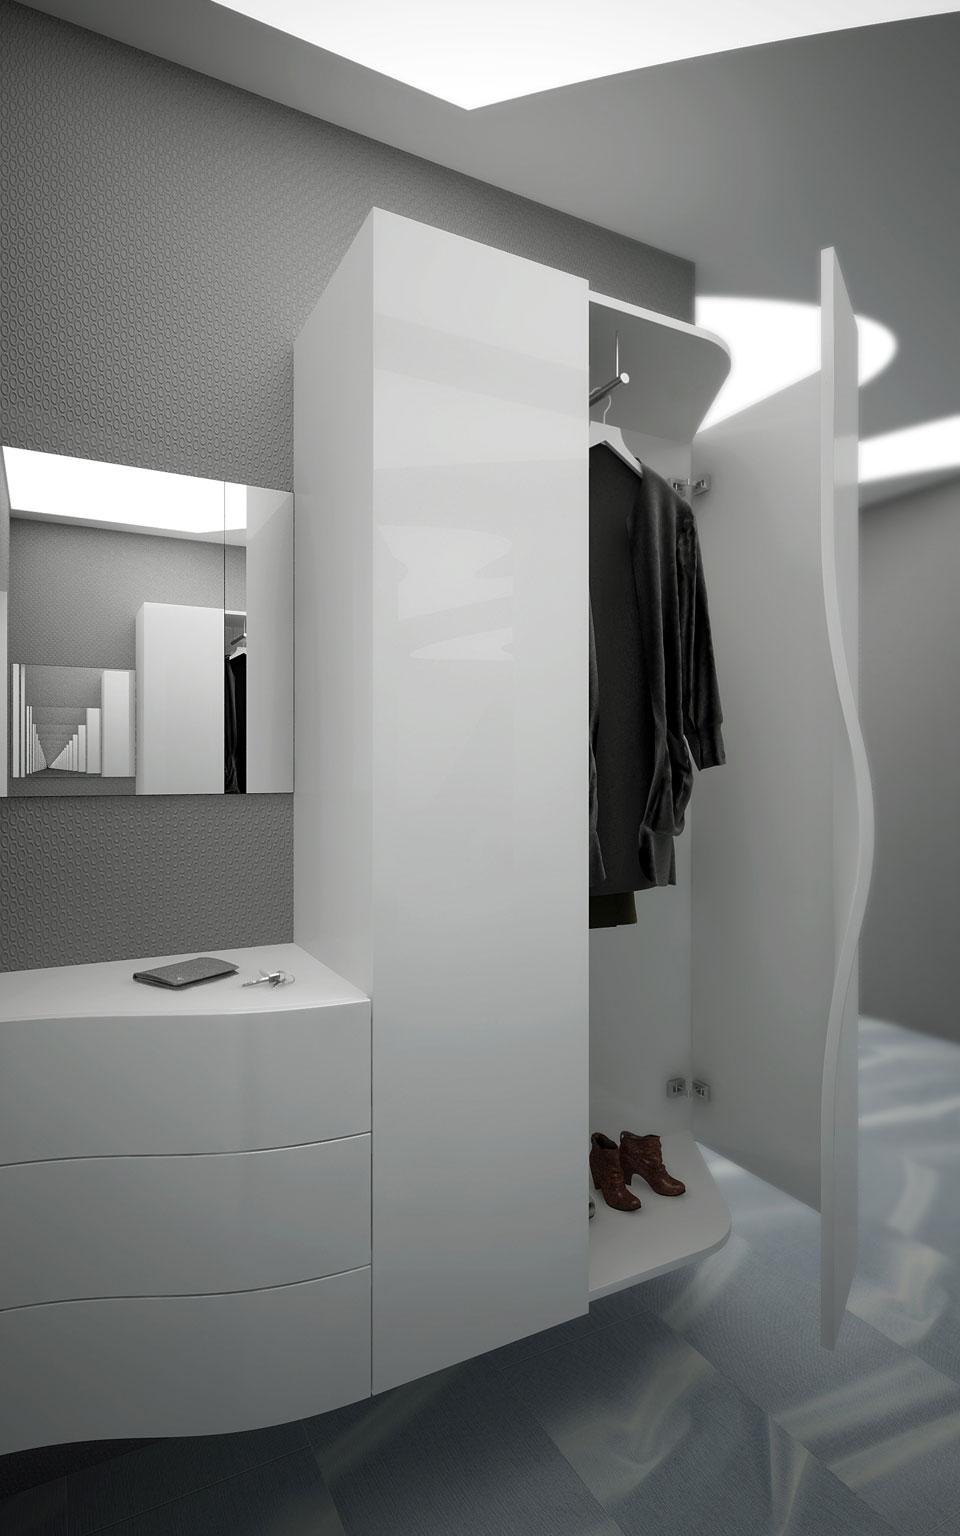 параметрический дизайн интерьера коридора киев